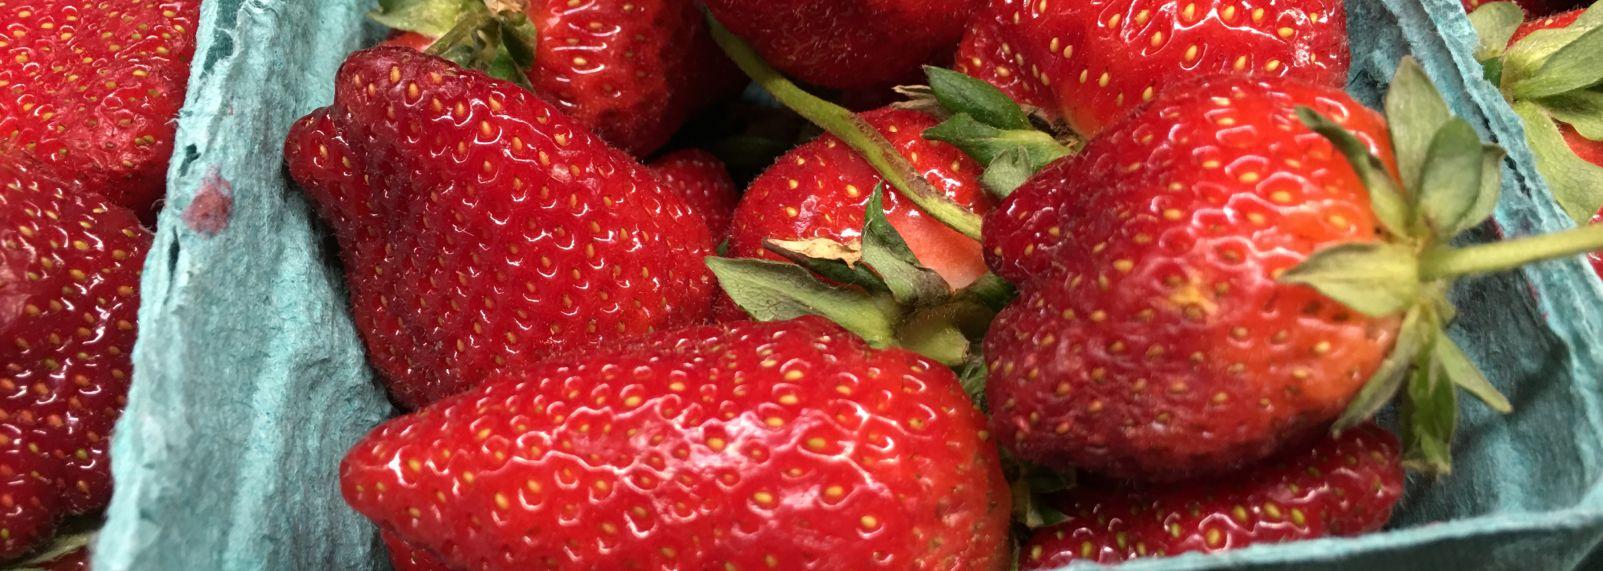 Standard Foods/fresh strawberries